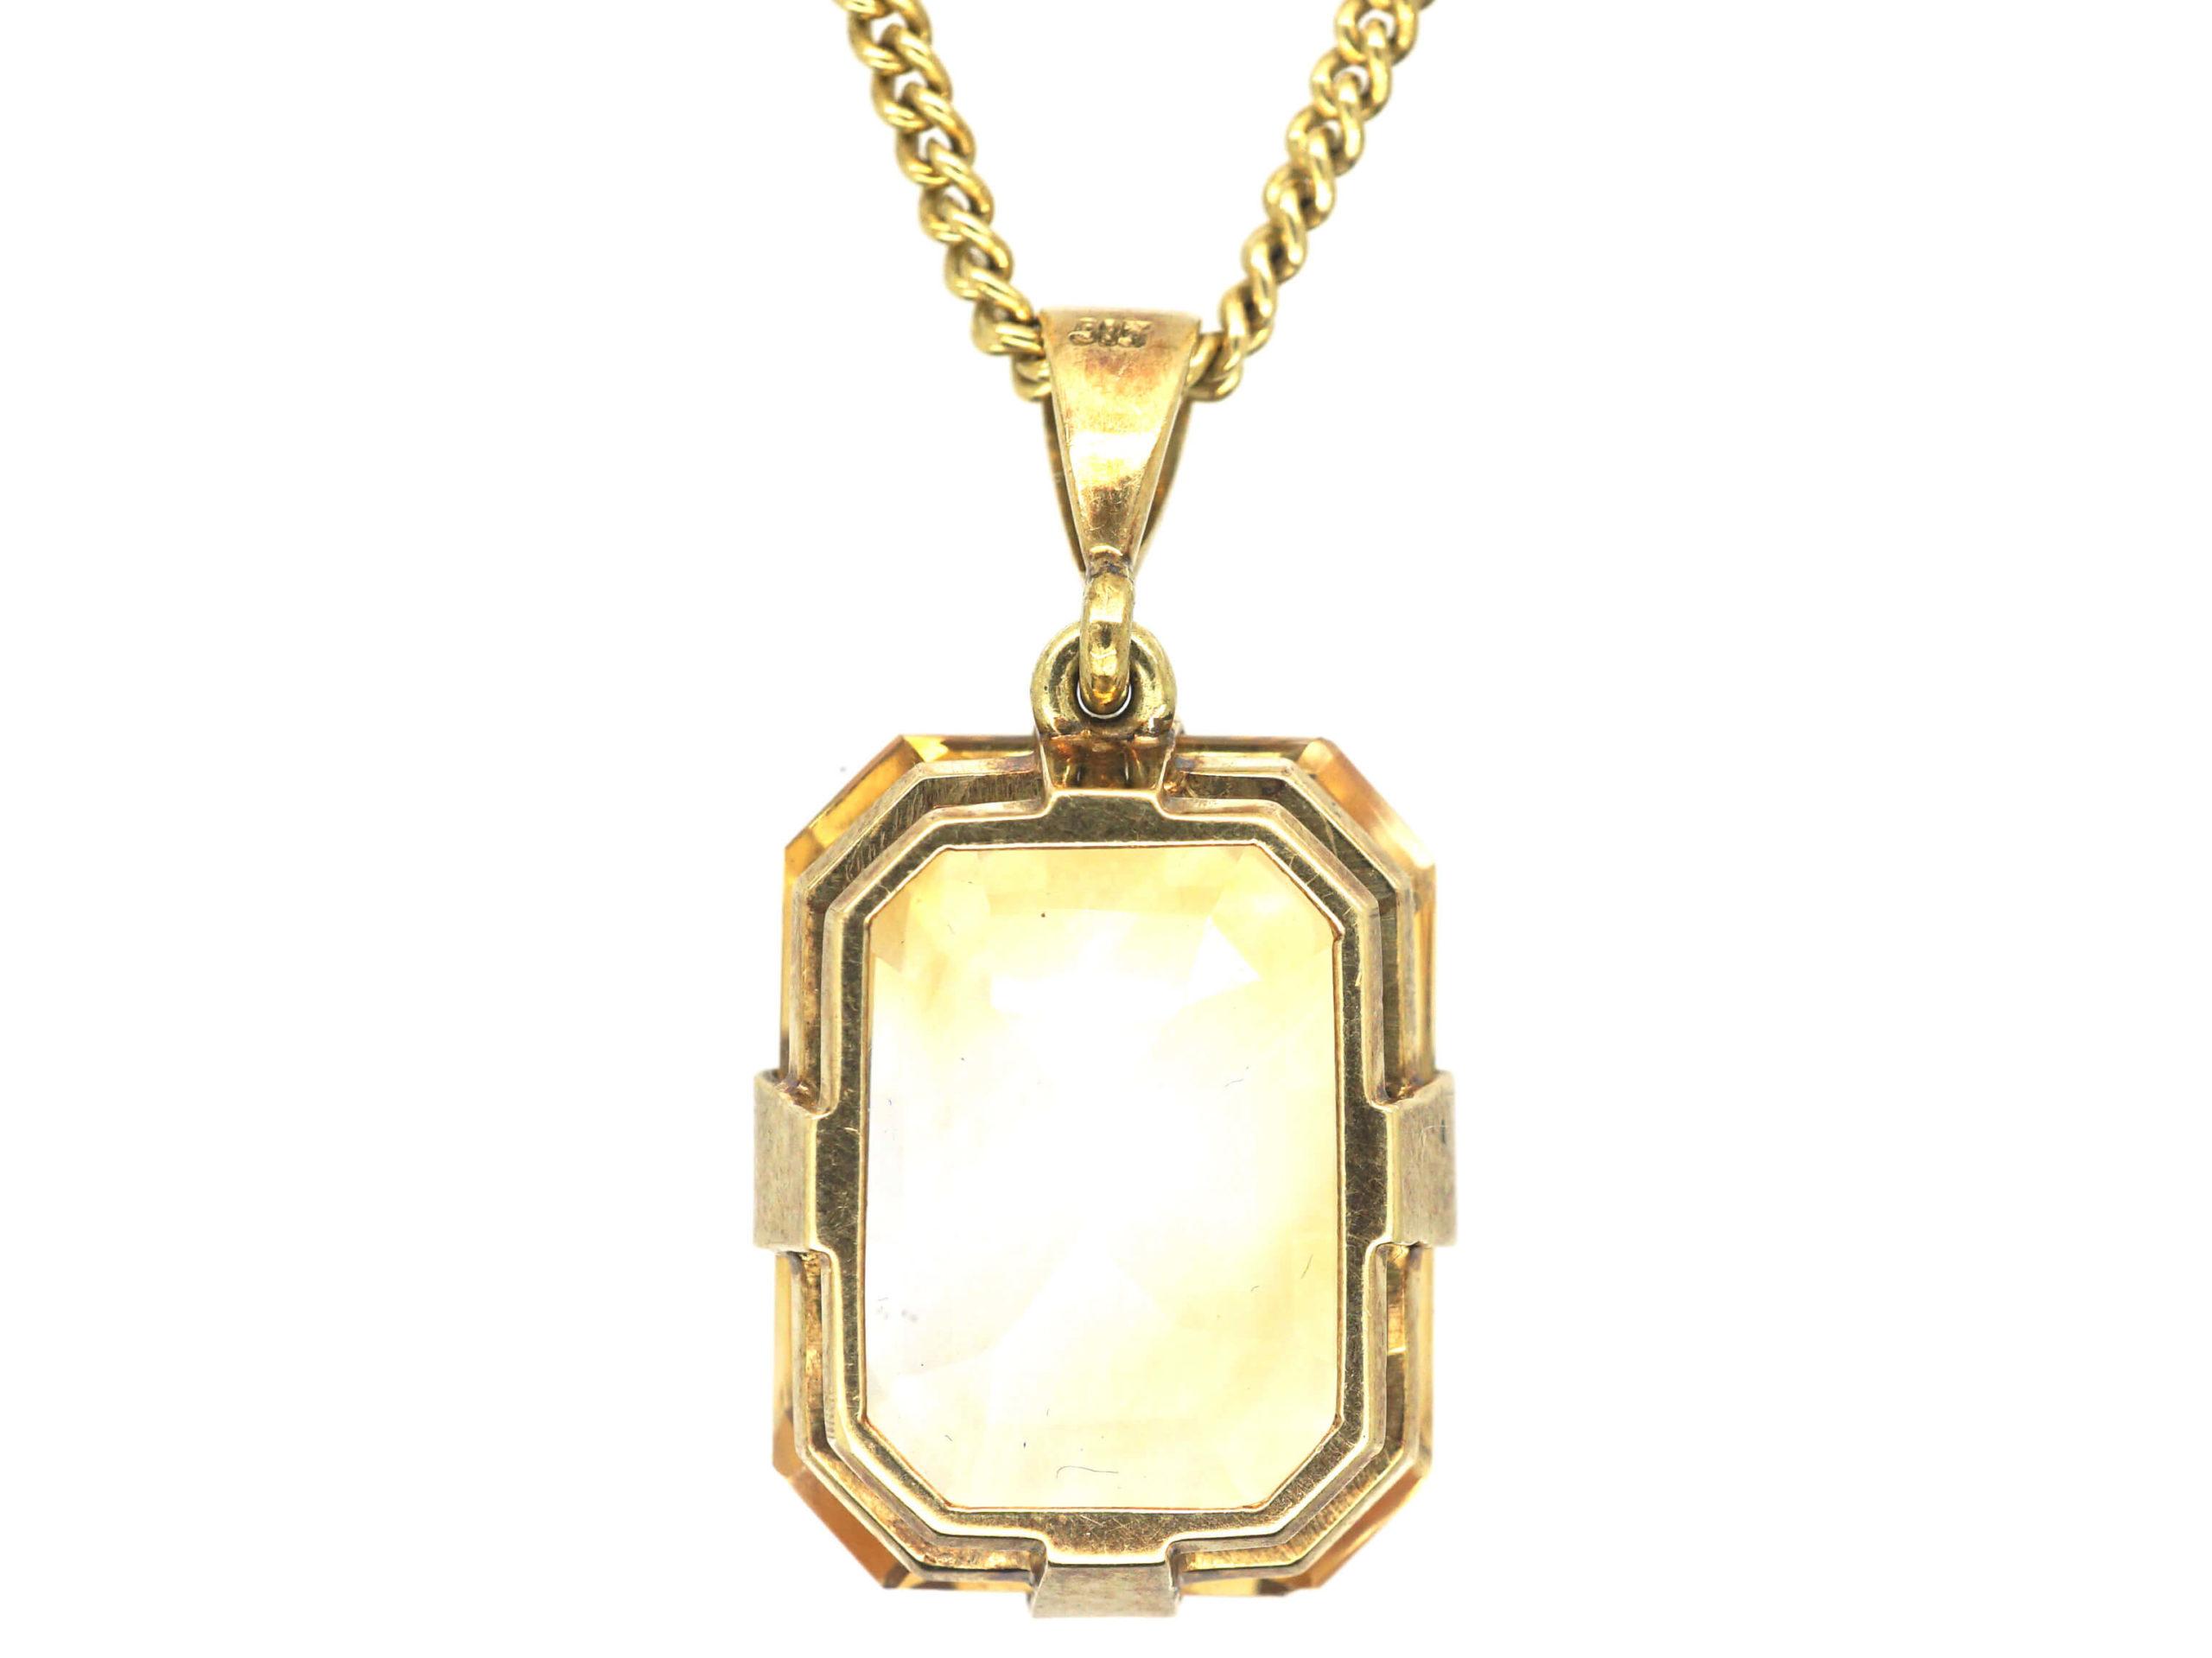 Art Deco 14ct Gold & Citrine Pendant on Silver Gilt Chain